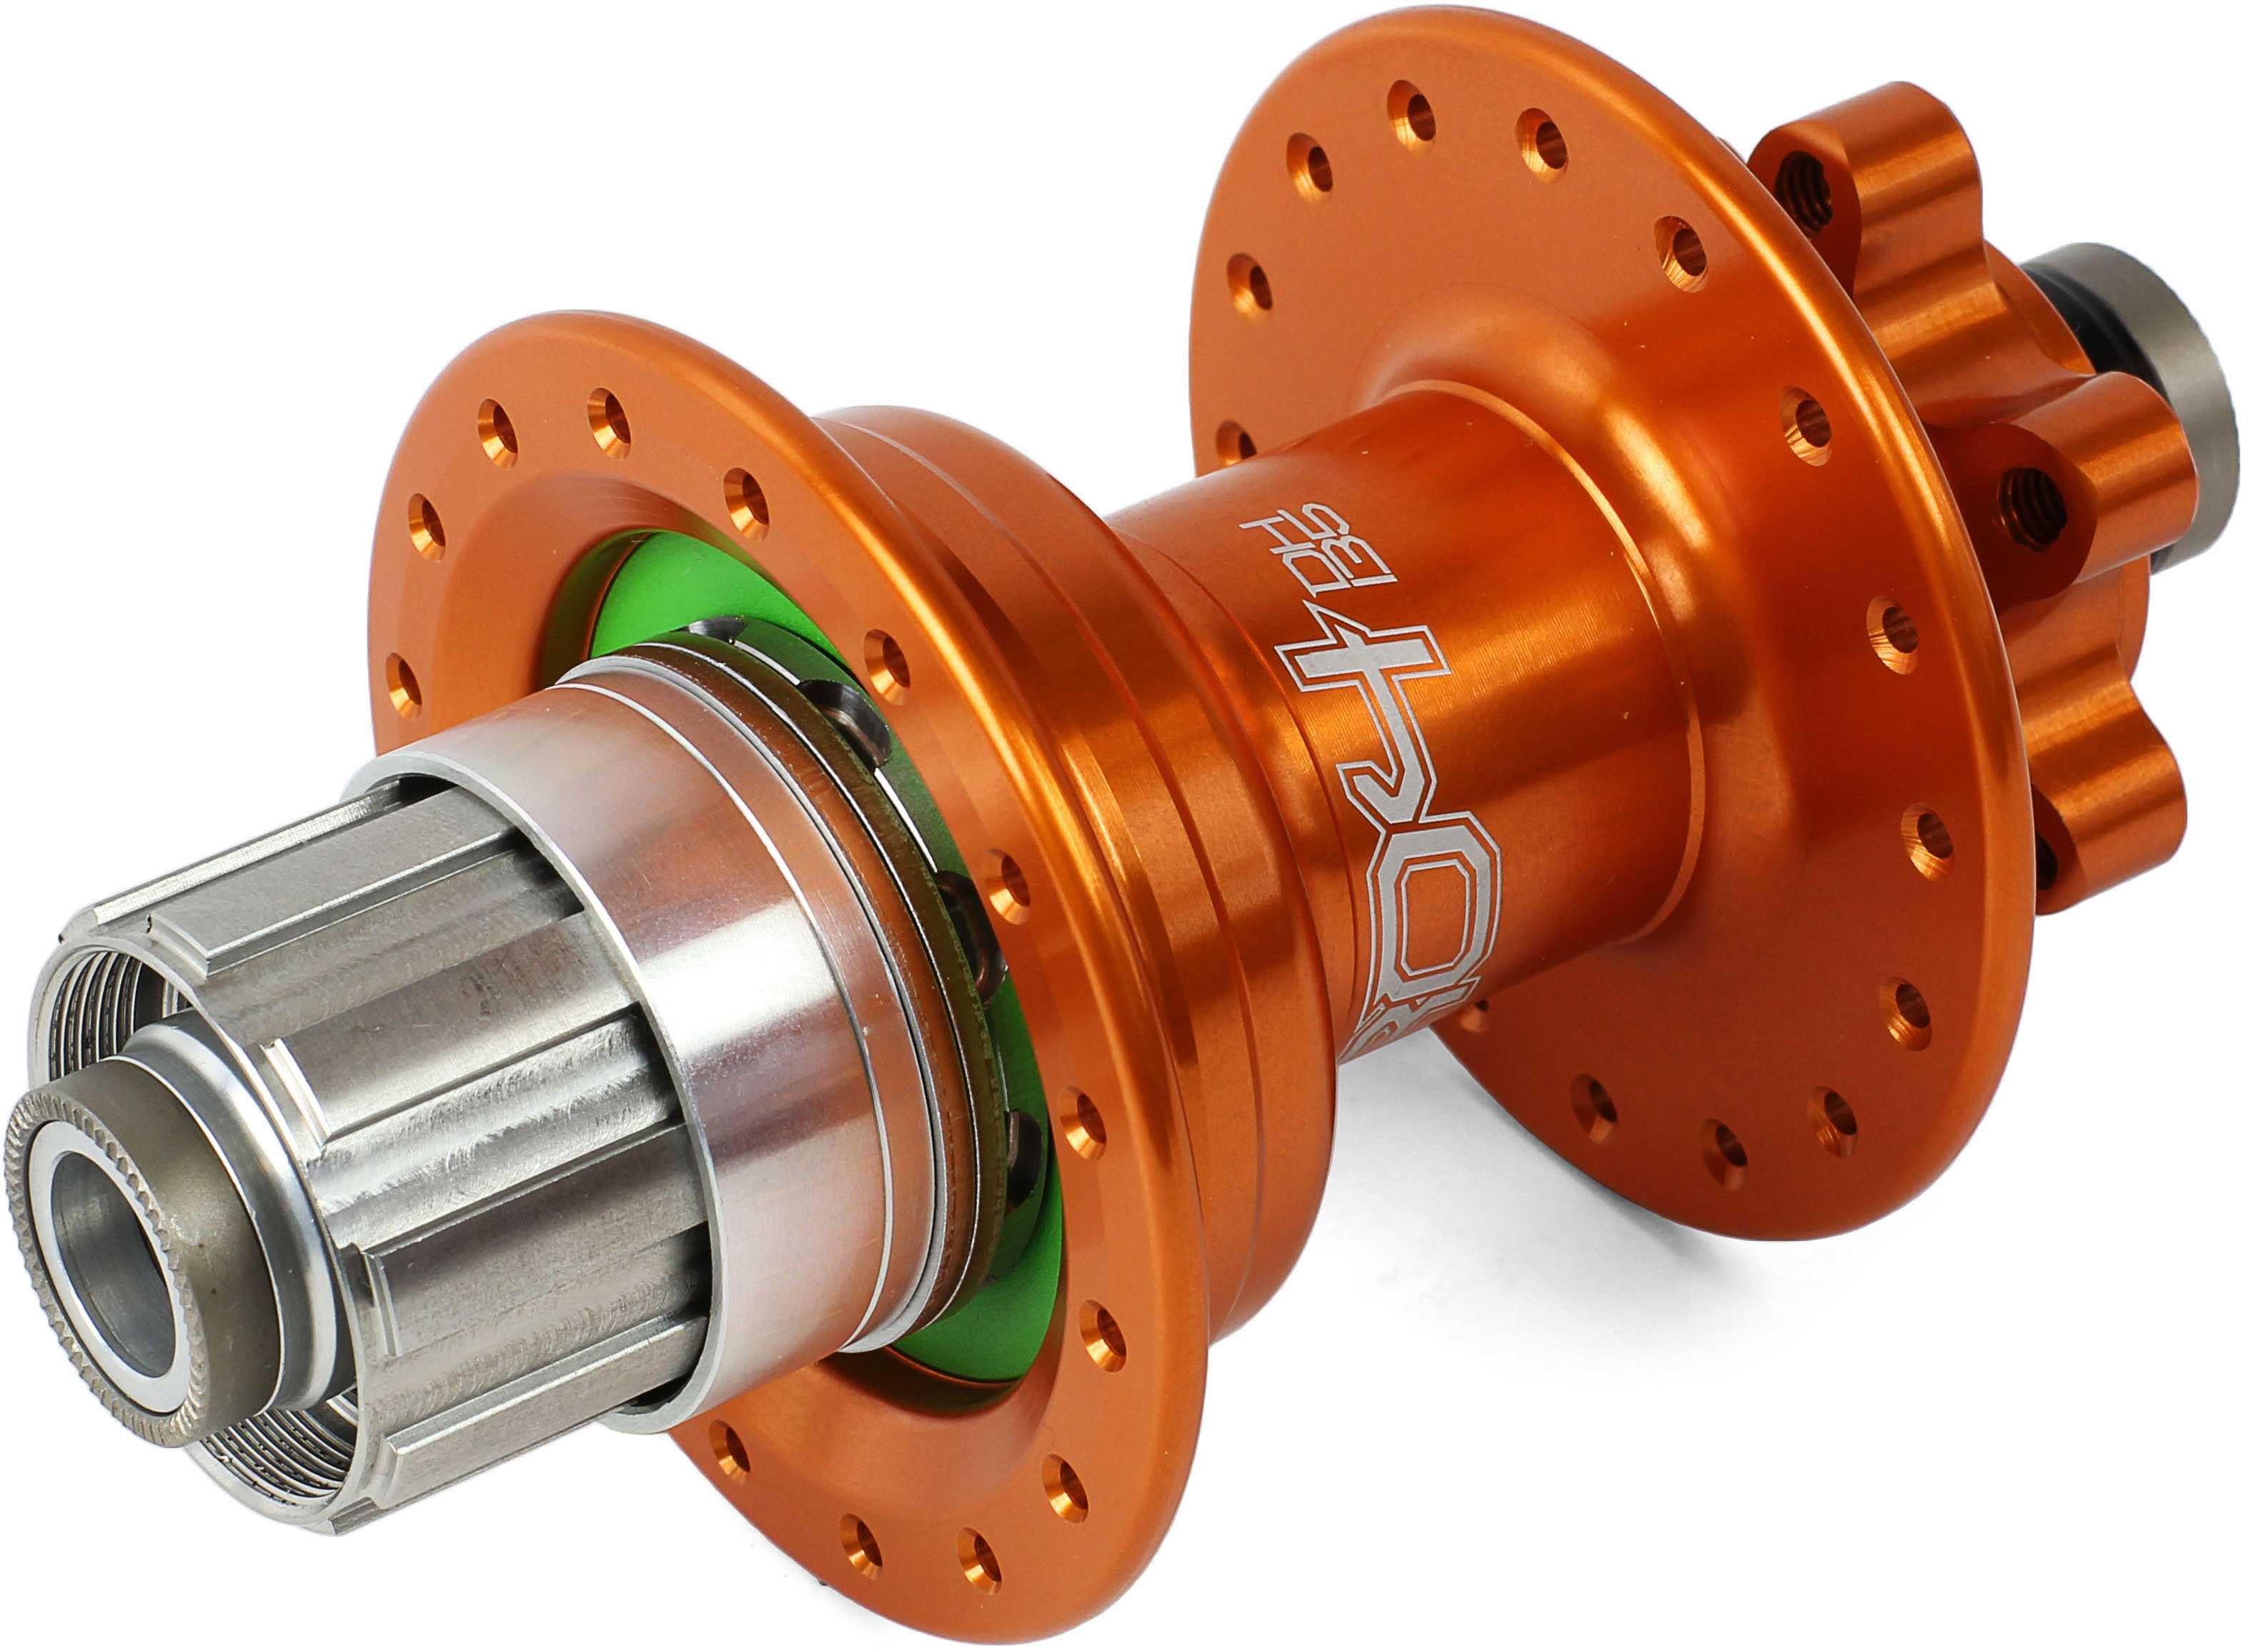 Bagnav Hope Pro 4 DH IS 36H 12 x 135 mm Shimano/SRAM stål orange | Hubs